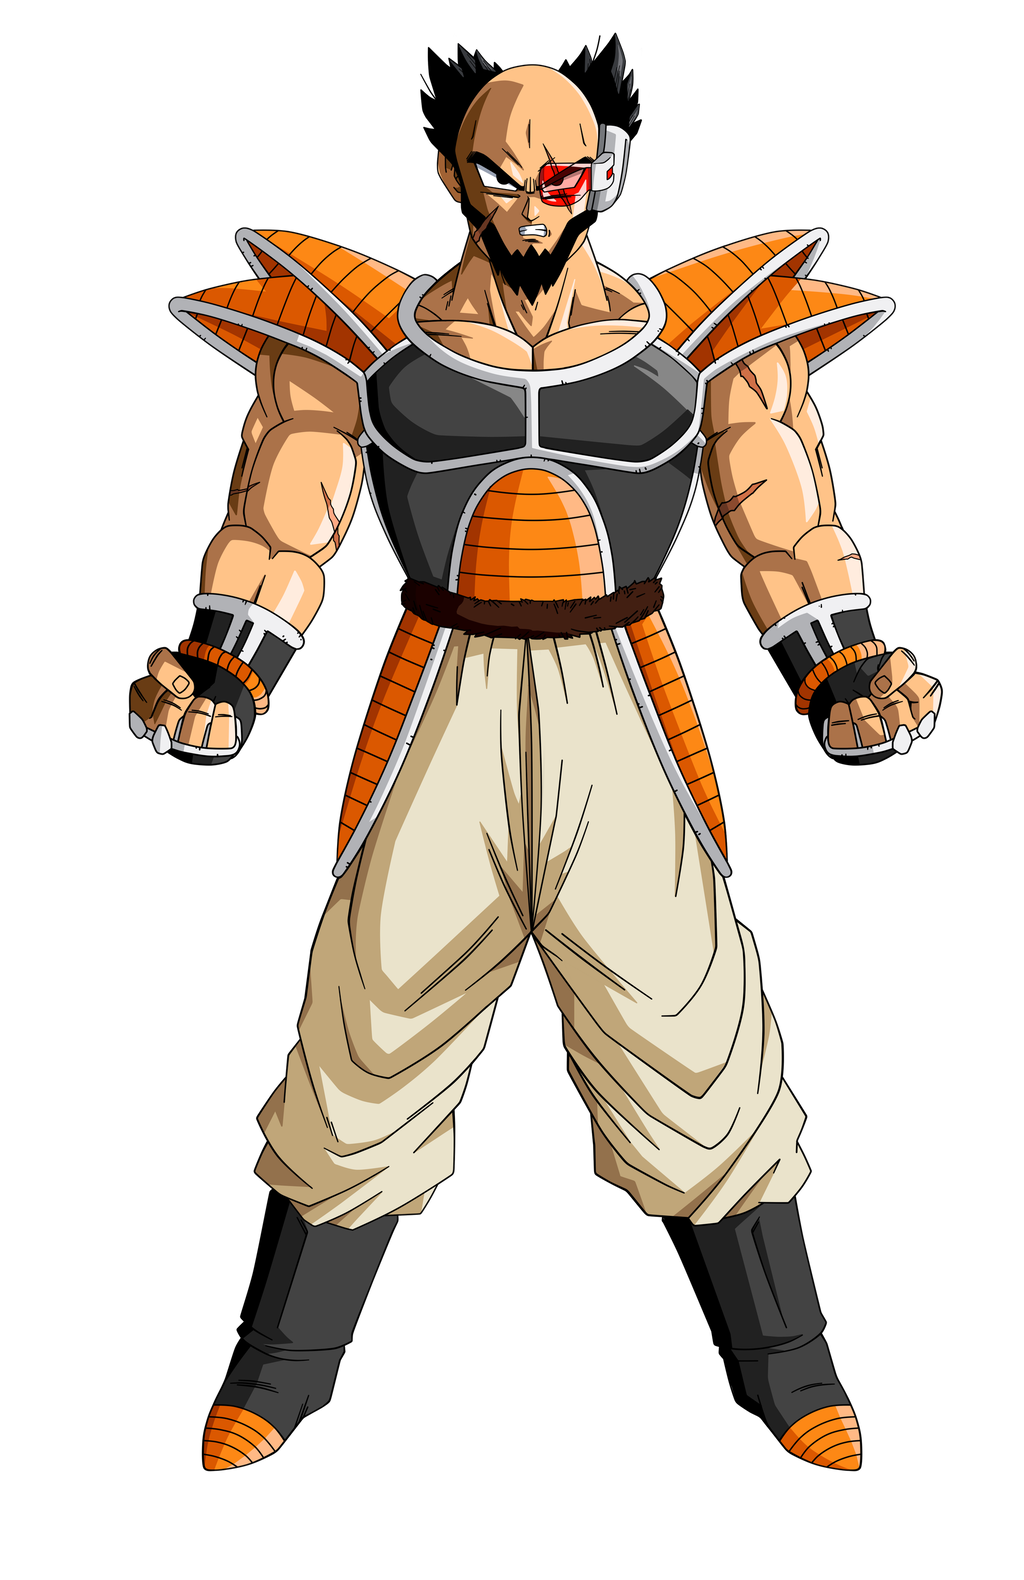 Blastrider Commissions Open On Twitter Dragon Ball Artwork Dragon Ball Super Goku Anime Dragon Ball Super